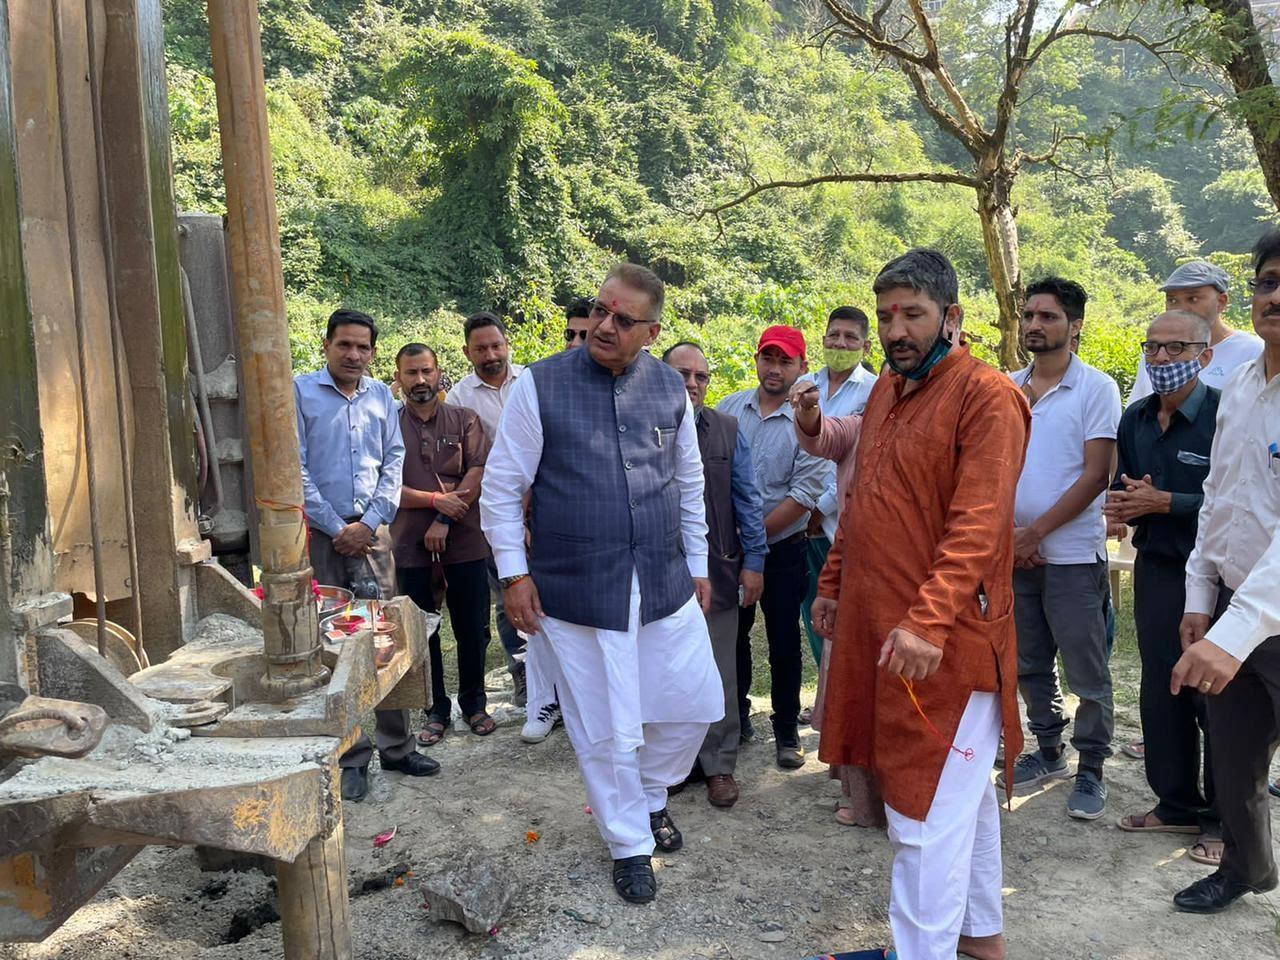 उत्तराखंड ब्रेकिंग न्यूज़ : कैबिनेट मंत्री गणेश जोशी ने किया कुठाल गांव पेयजल योजना का किया भूमिपूजन ।